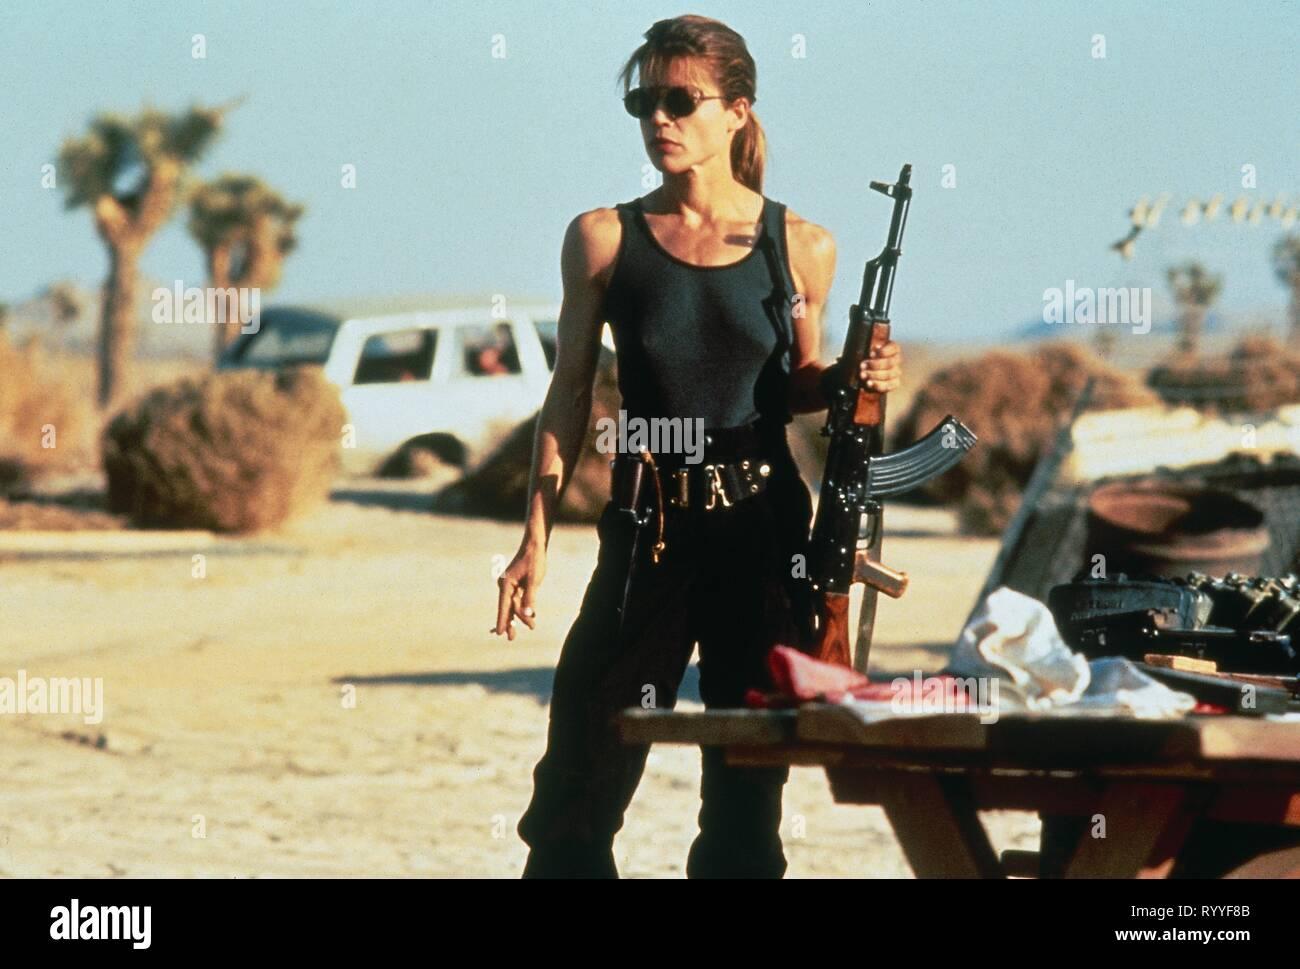 LINDA HAMILTON, TERMINATOR 2: JUDGMENT DAY, 1991 - Stock Image